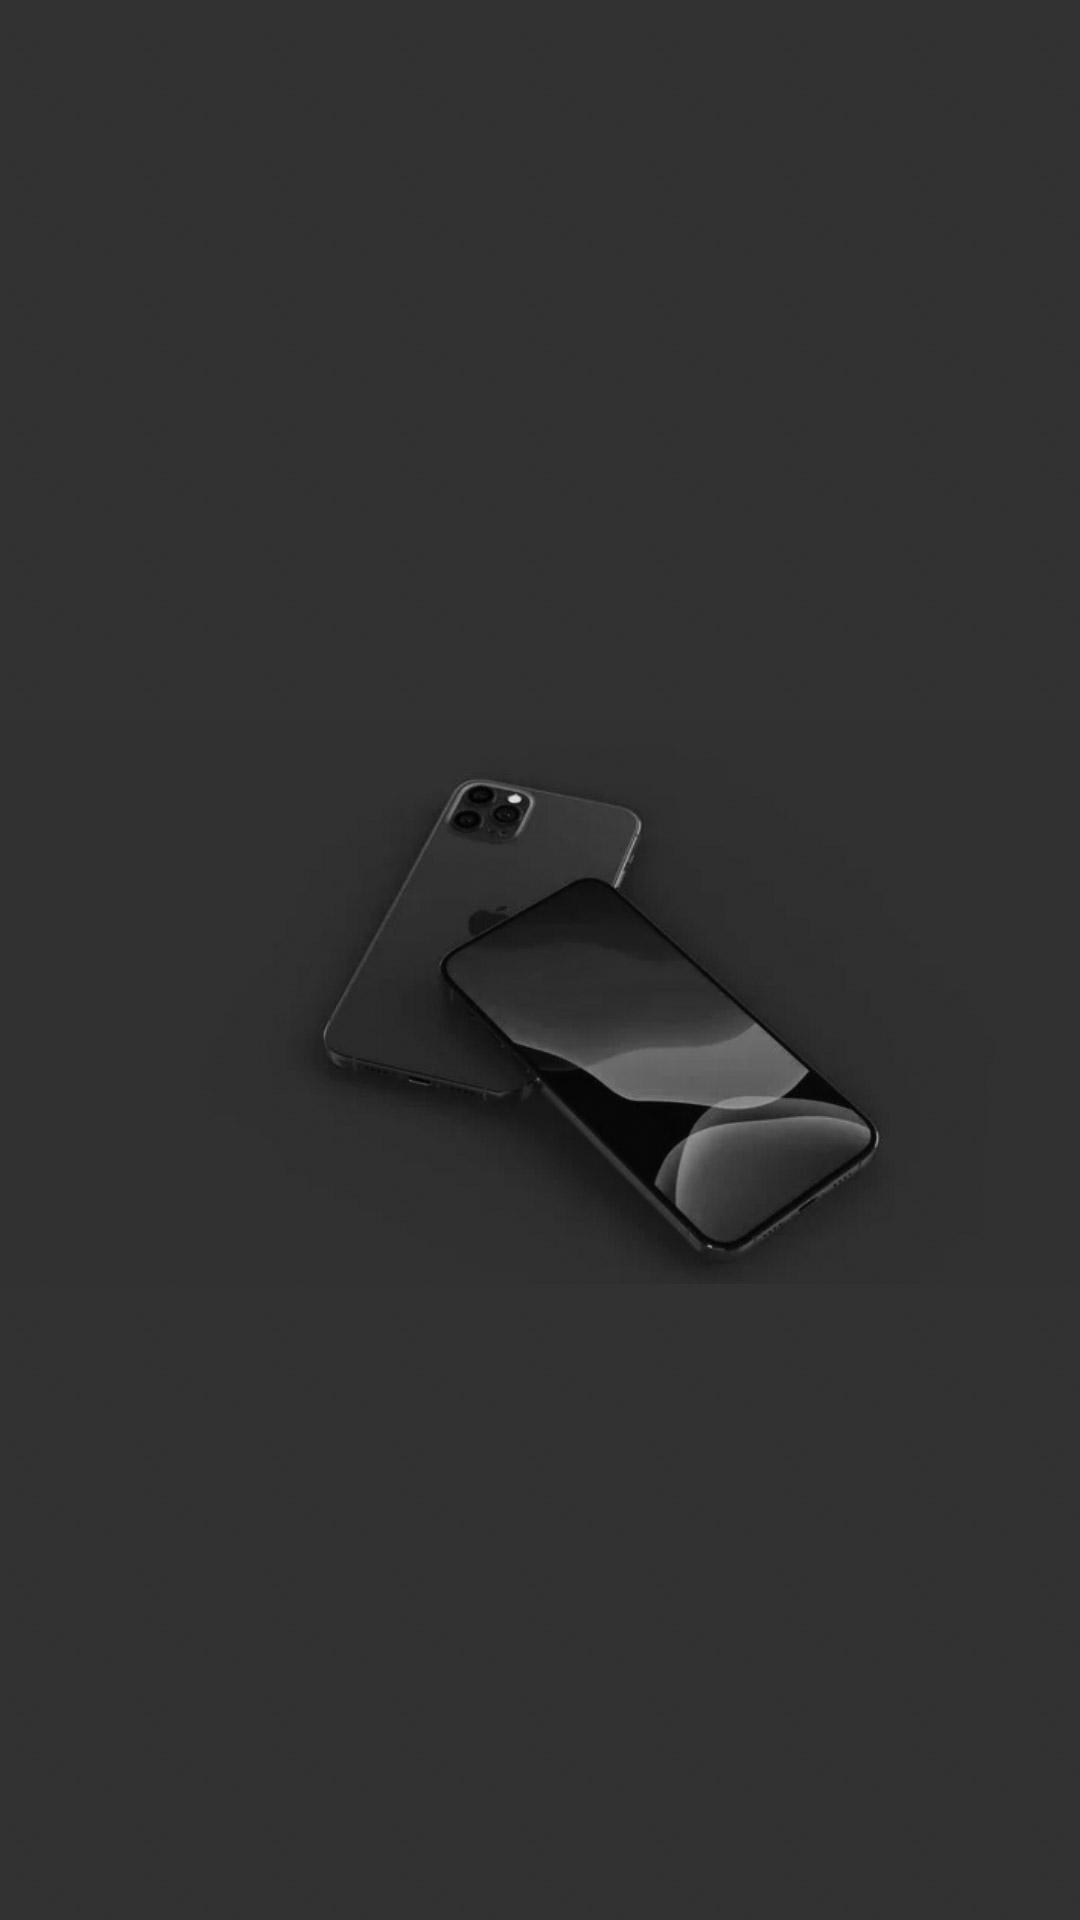 New iPhone 12 Wallpaper Download 1080x1920